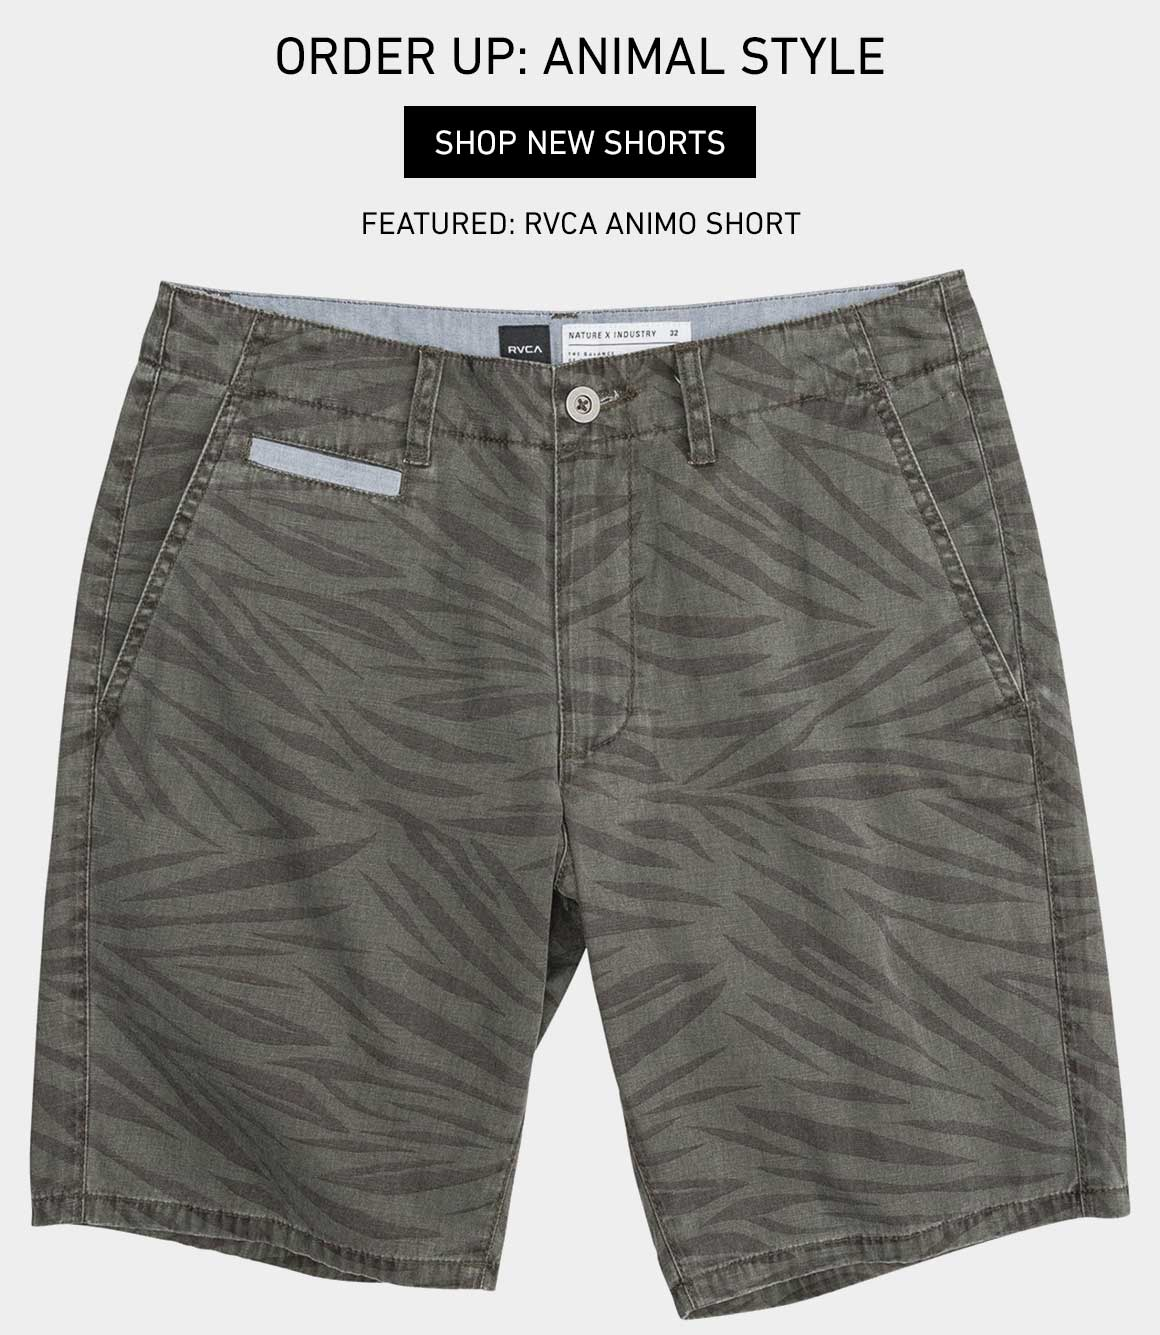 Order Up: Animal Style - Shop New Shorts